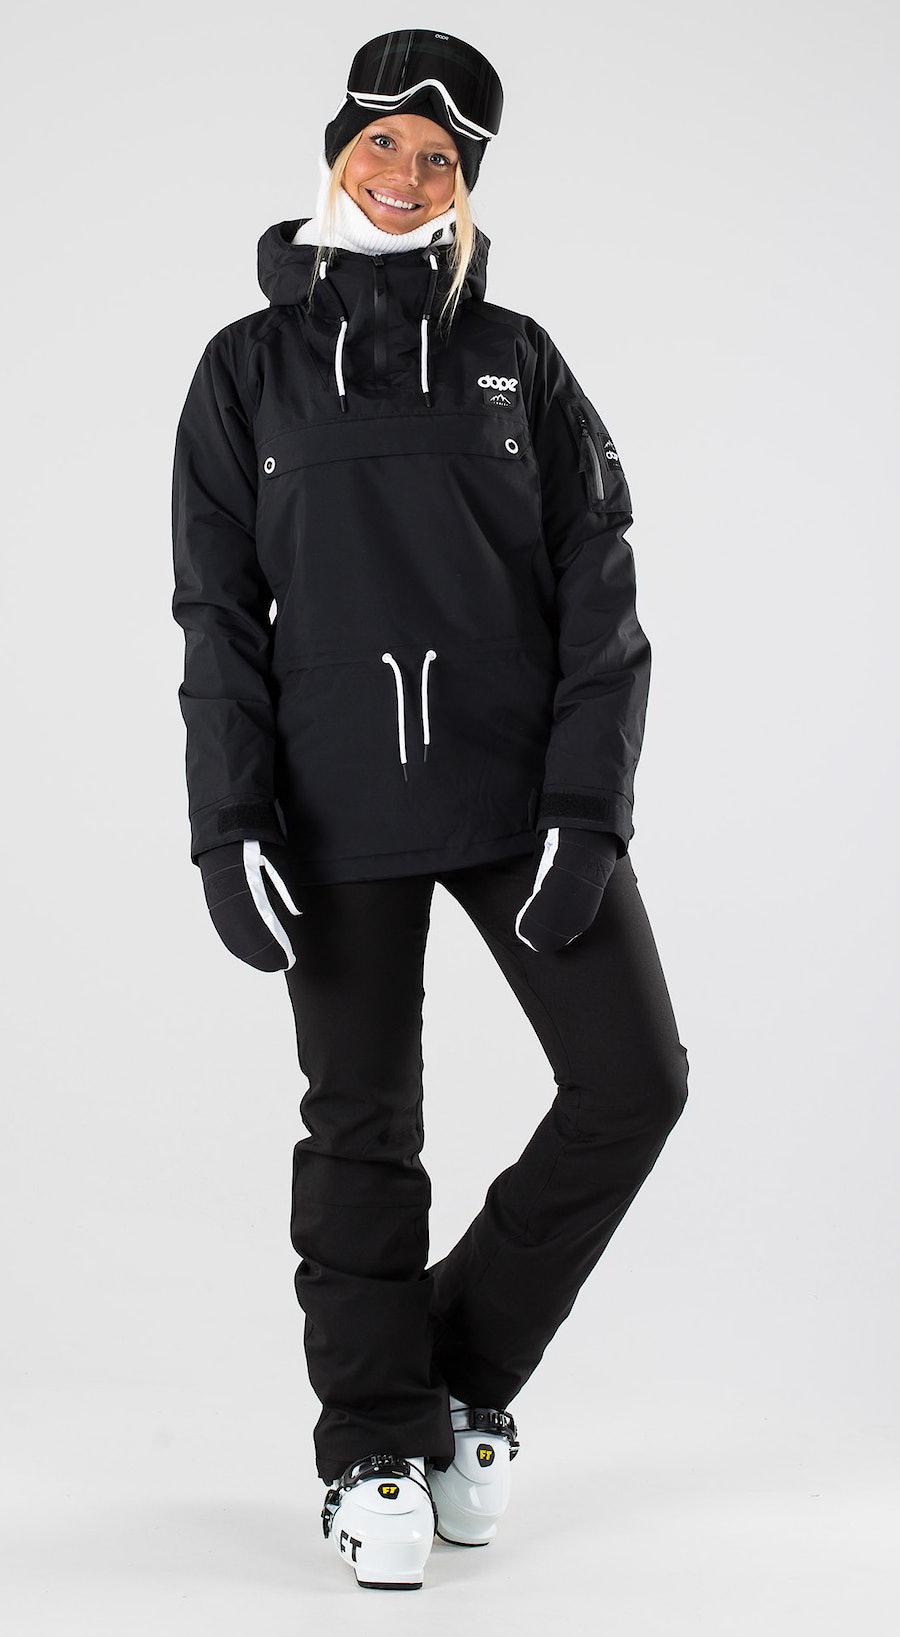 Dope Annok W Black Skibekleidung Multi